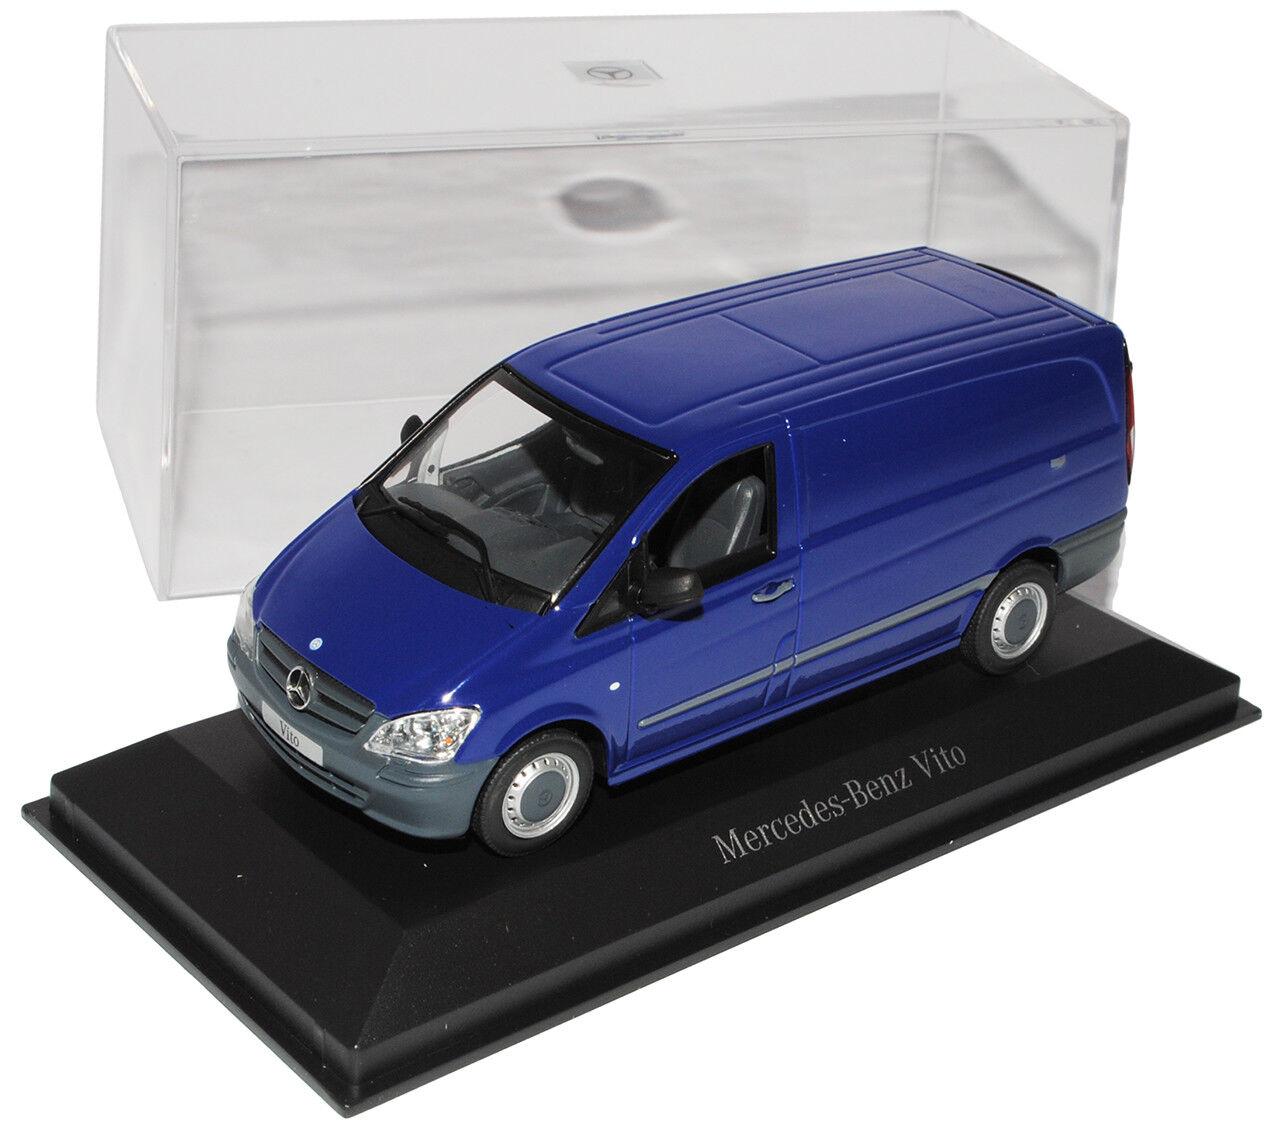 Mercedes-Benz Vito azul recuadro Transporter a a a partir de Facelift 2010 w639 1 43 minicham... f0b3ac